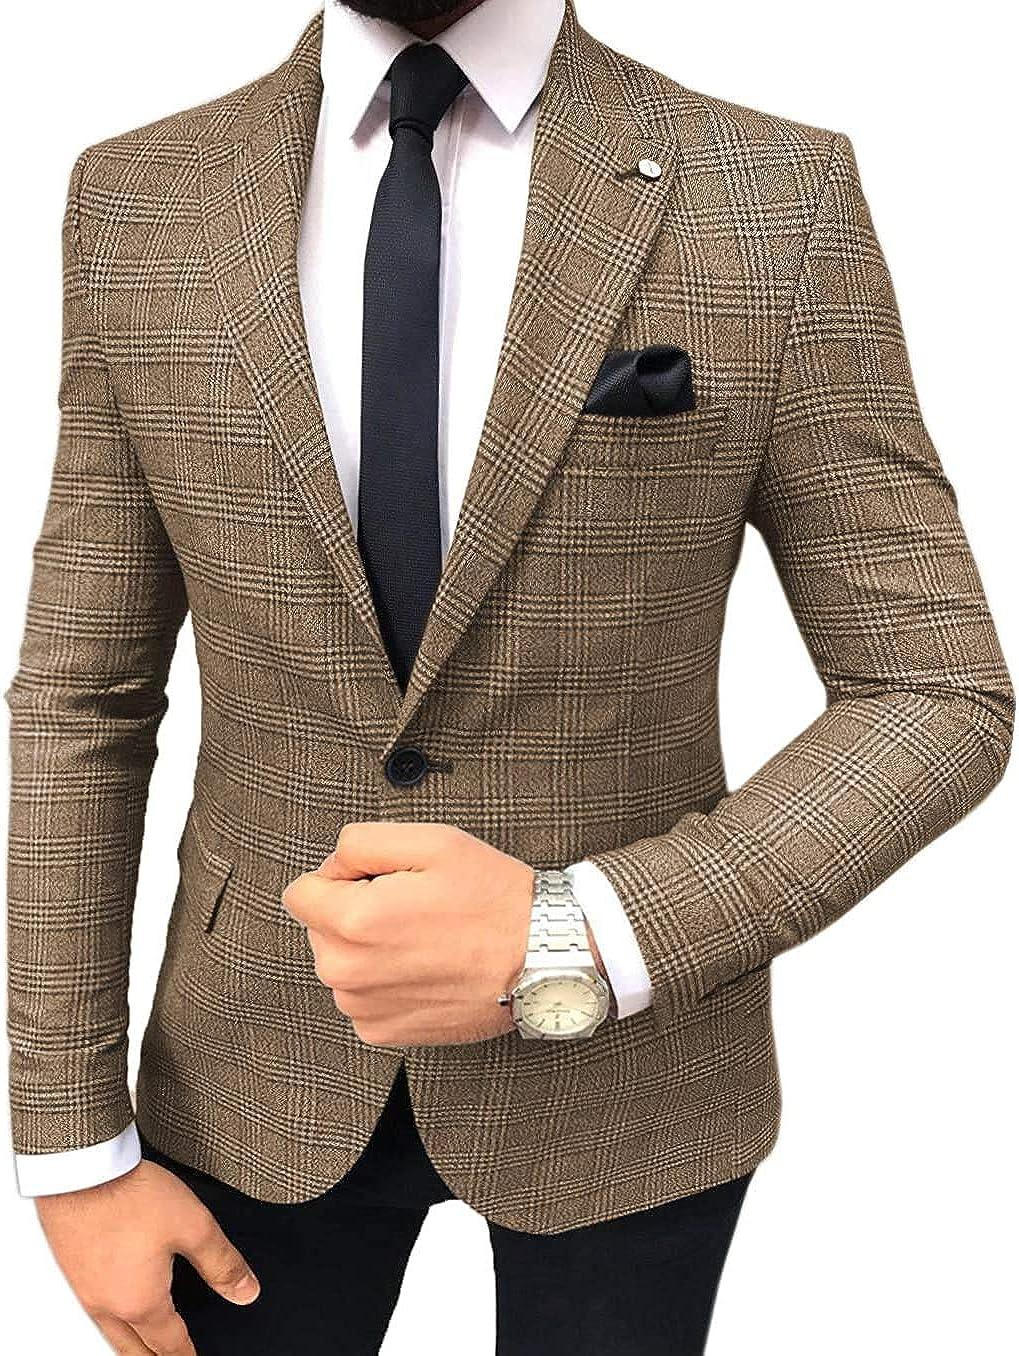 Casual Men's Suits Jacket Slim Fit Plaid Wool Prom Blazer Business Outwear Wedding Groom